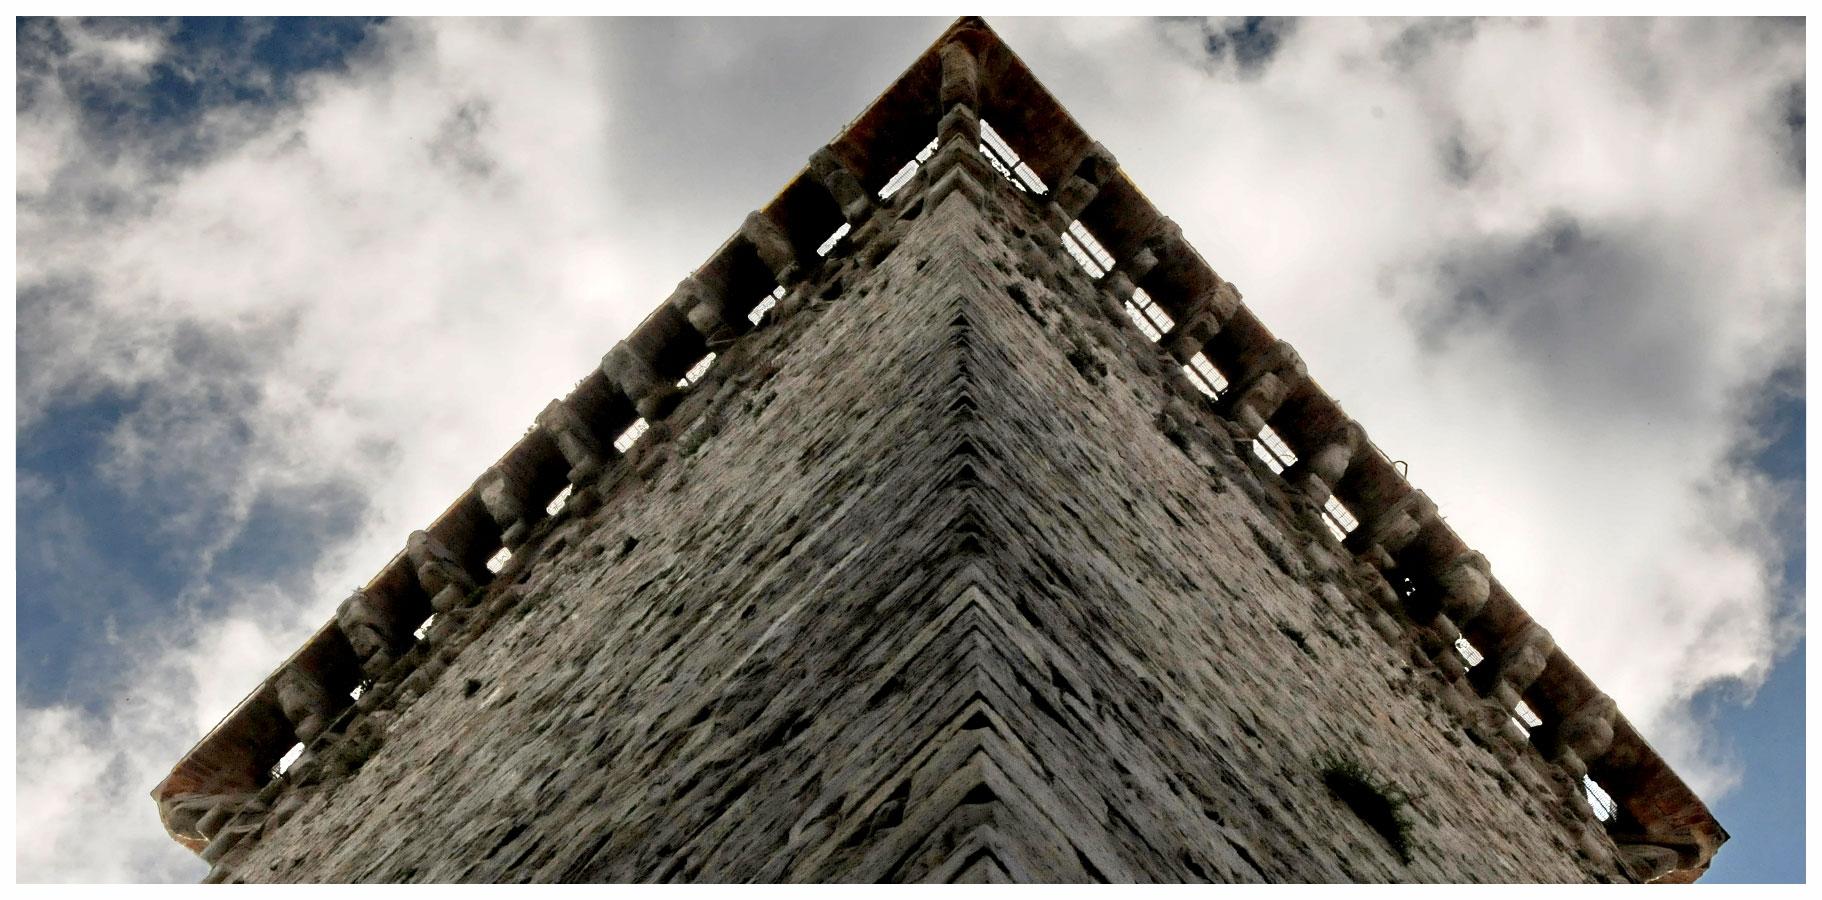 torre-di-murazzano-3.jpg